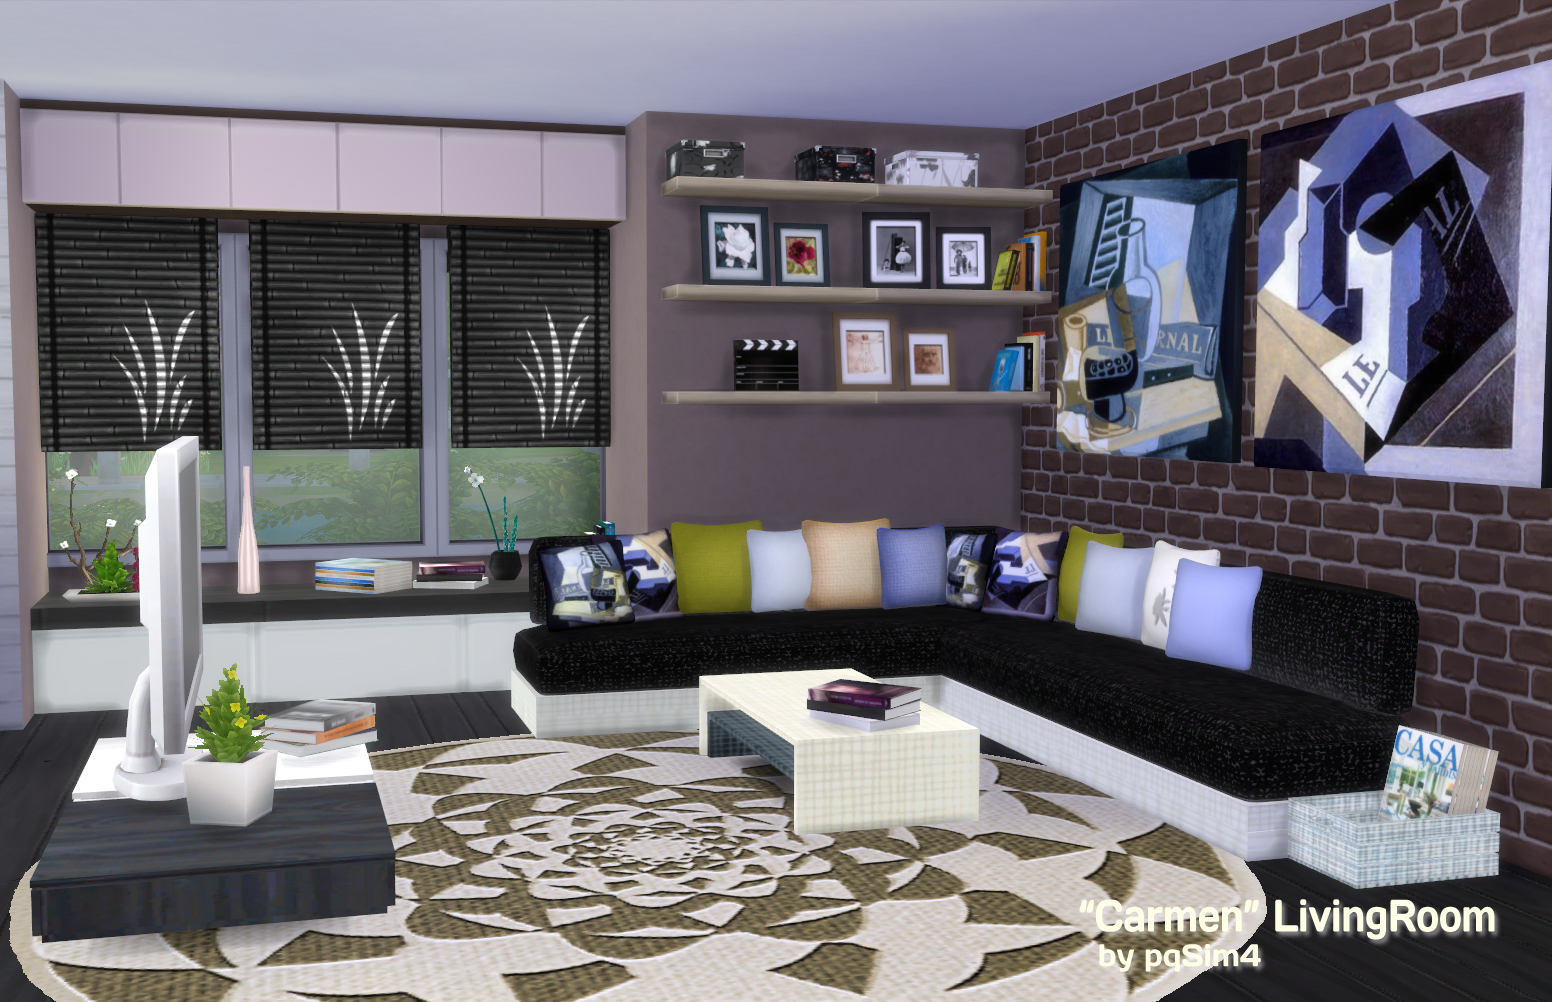 Bargain Hunt sims 2 living room set walls and